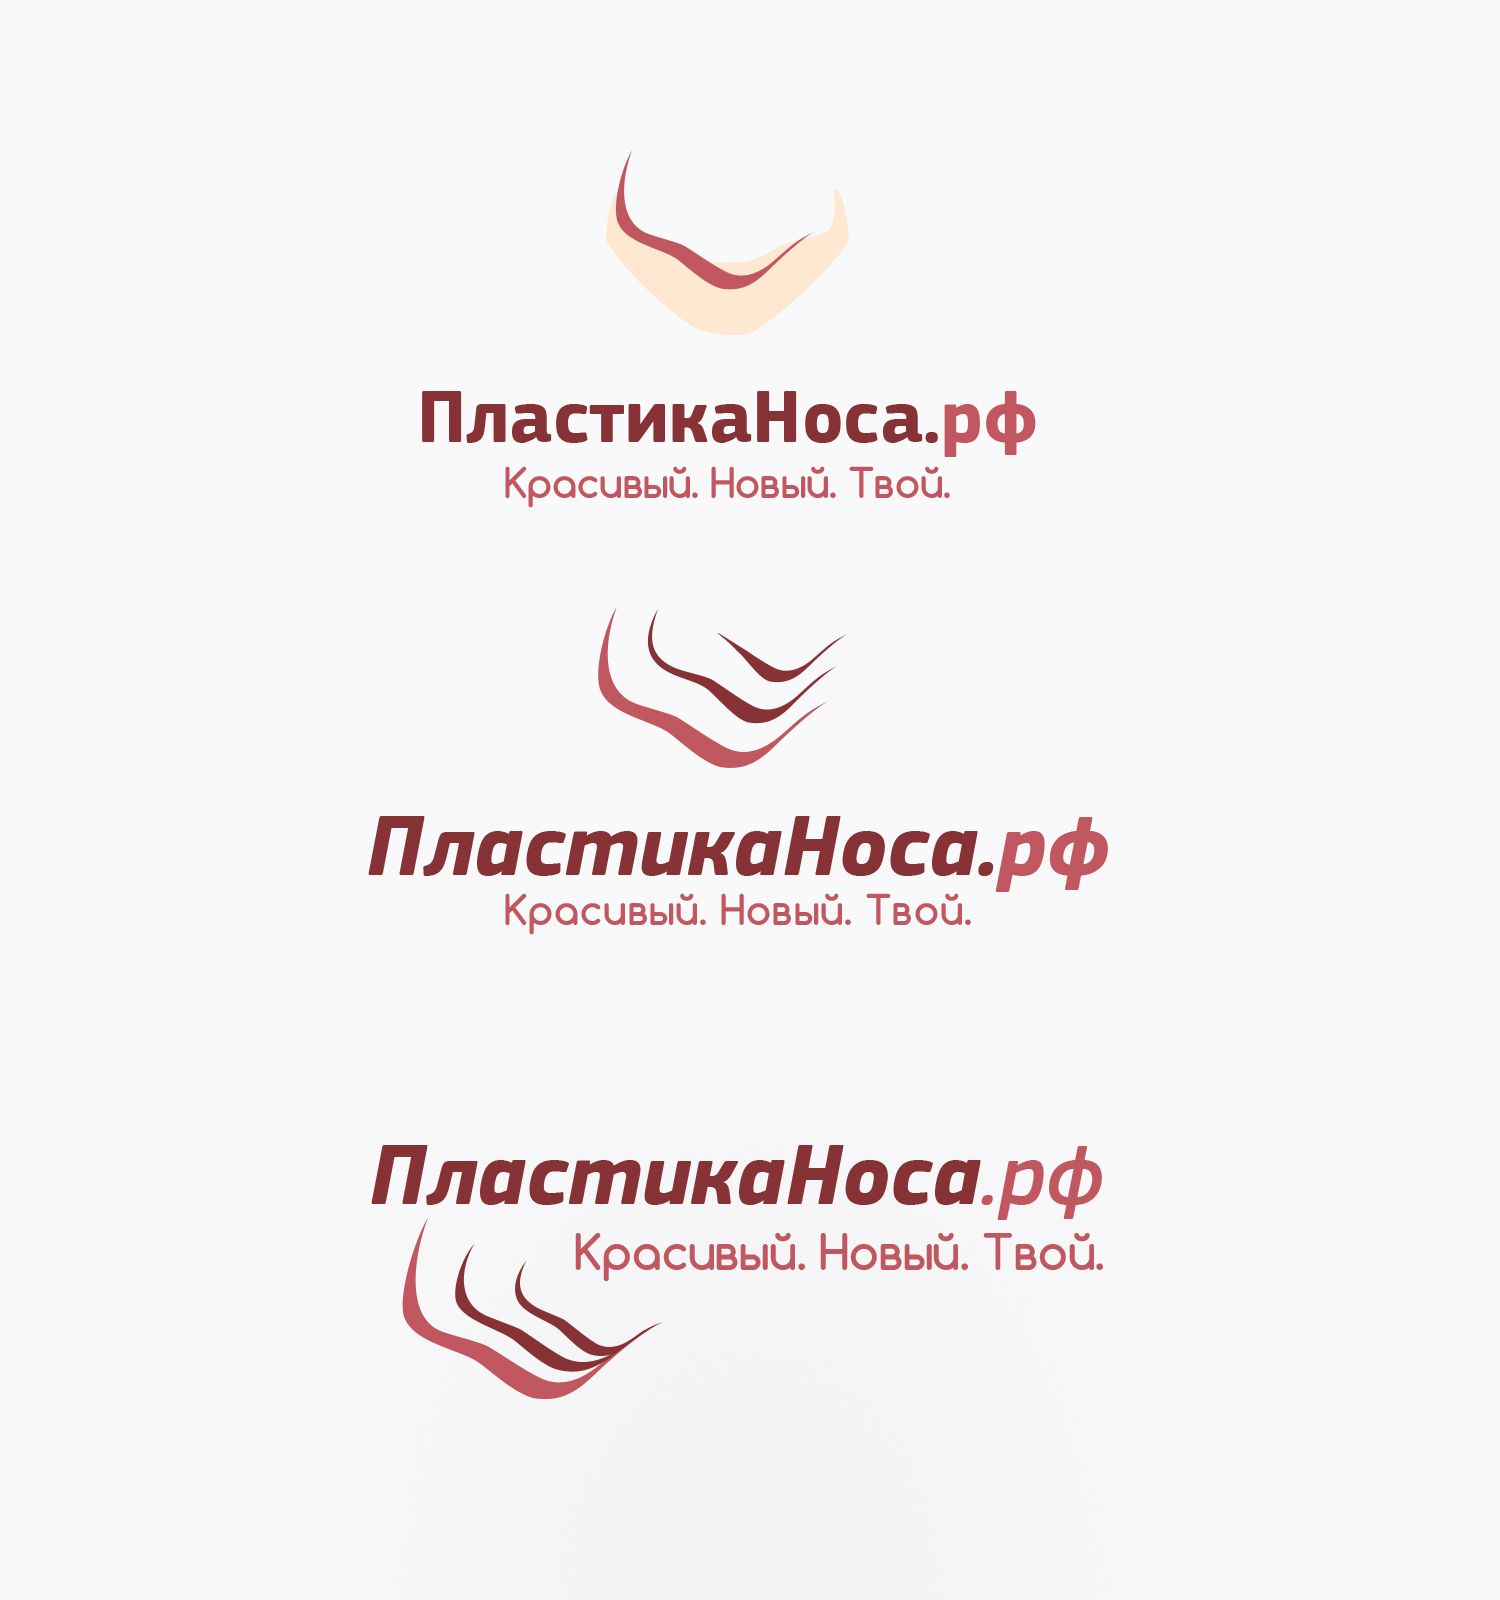 Логотип ПластикаНоса.рф - дизайнер Brandistock